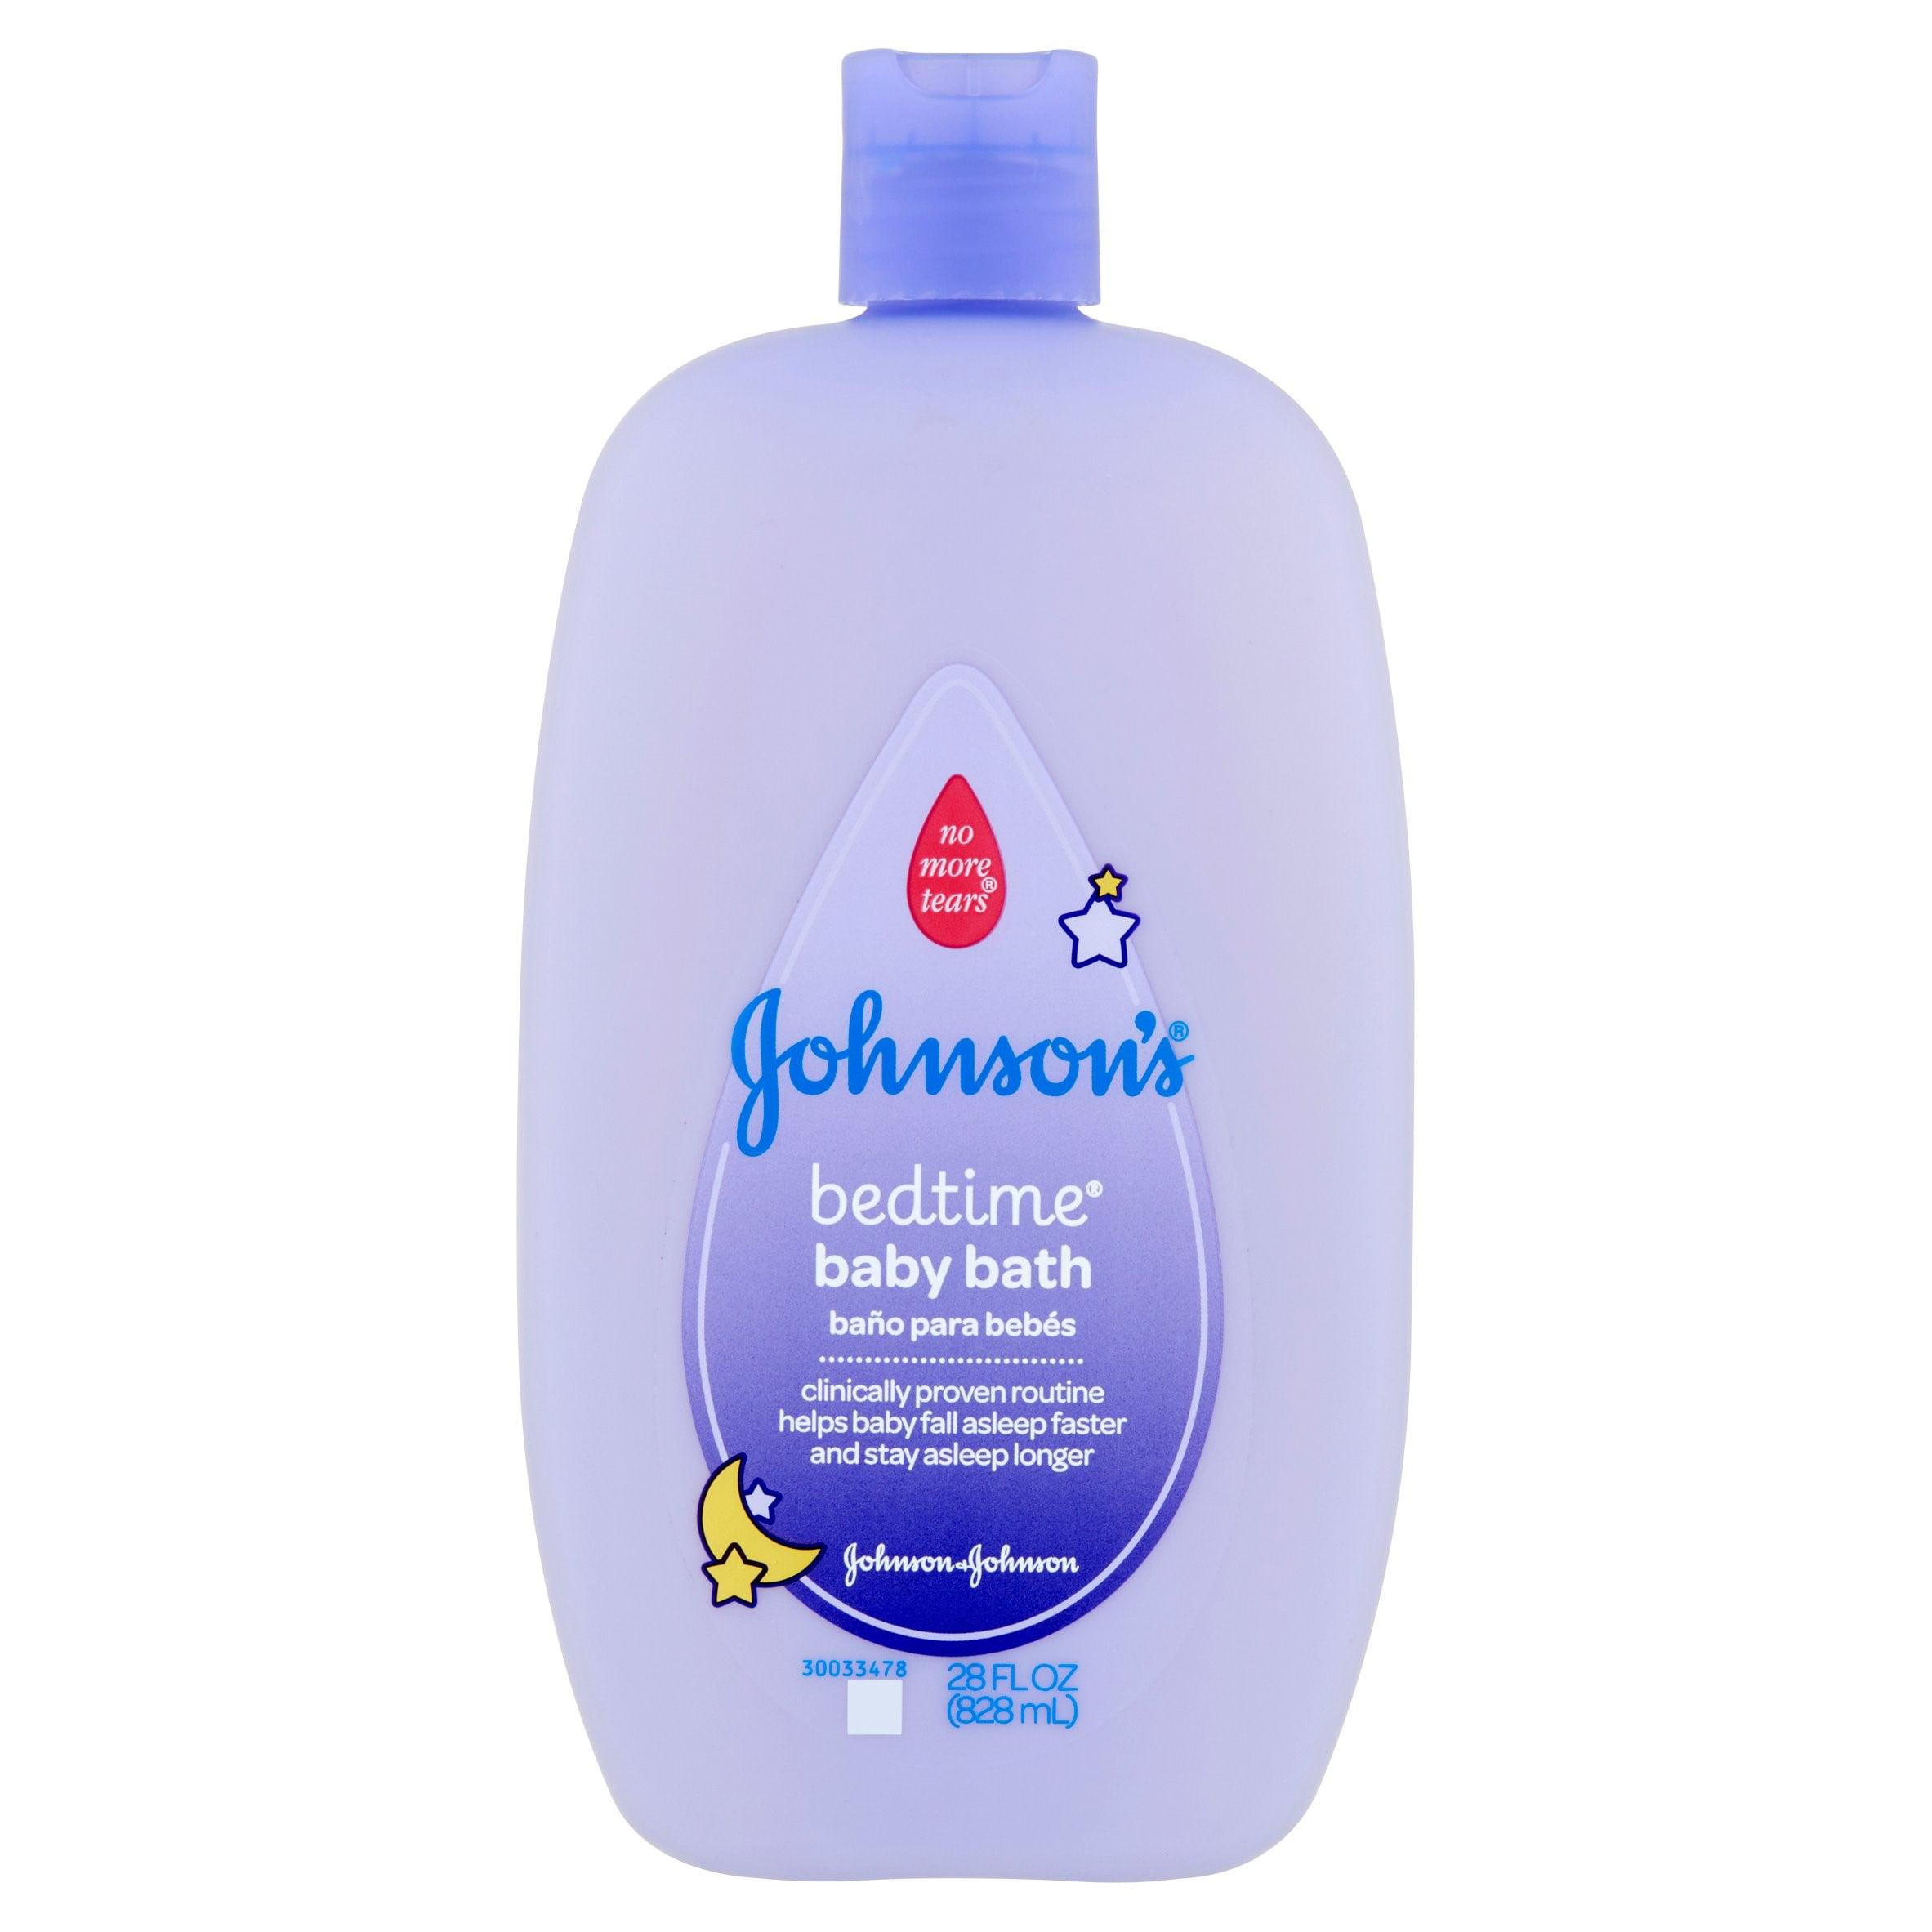 Johnson & Johnson Johnson\'s Bedtime Baby Bath, 28 fl oz - Walmart.com